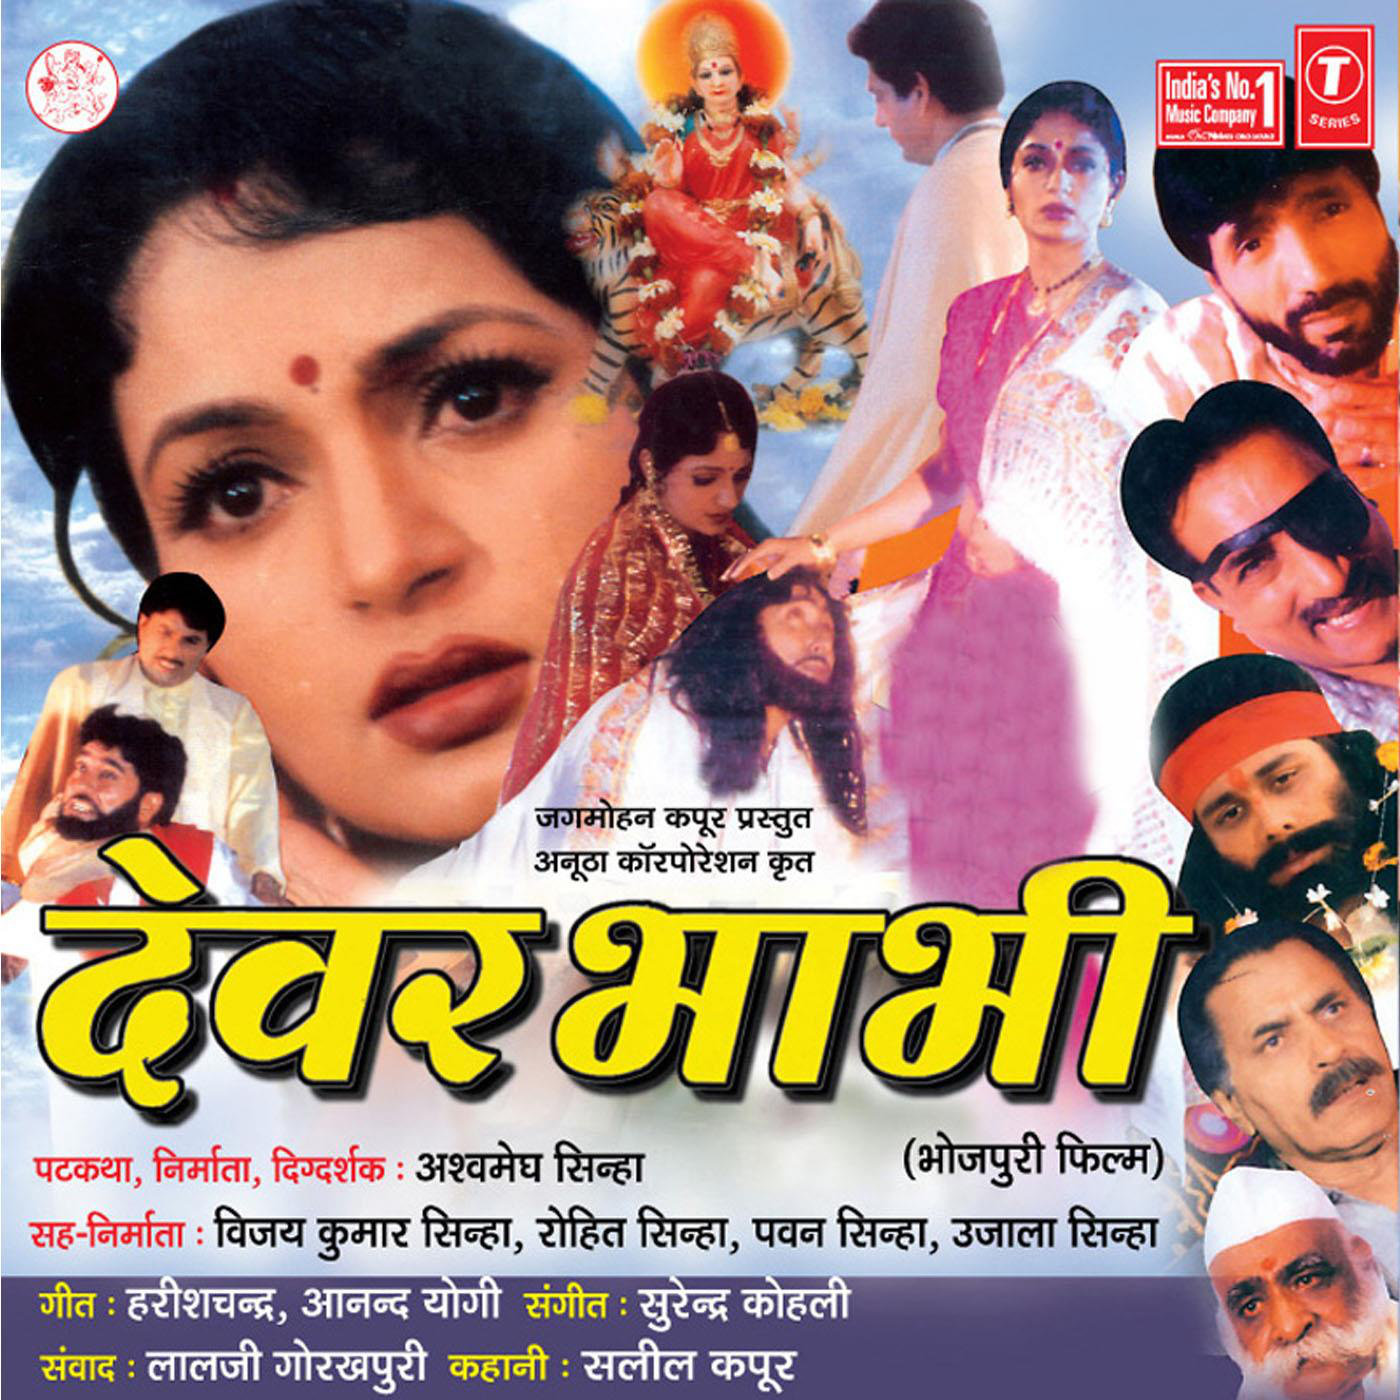 devar bhabhi video download